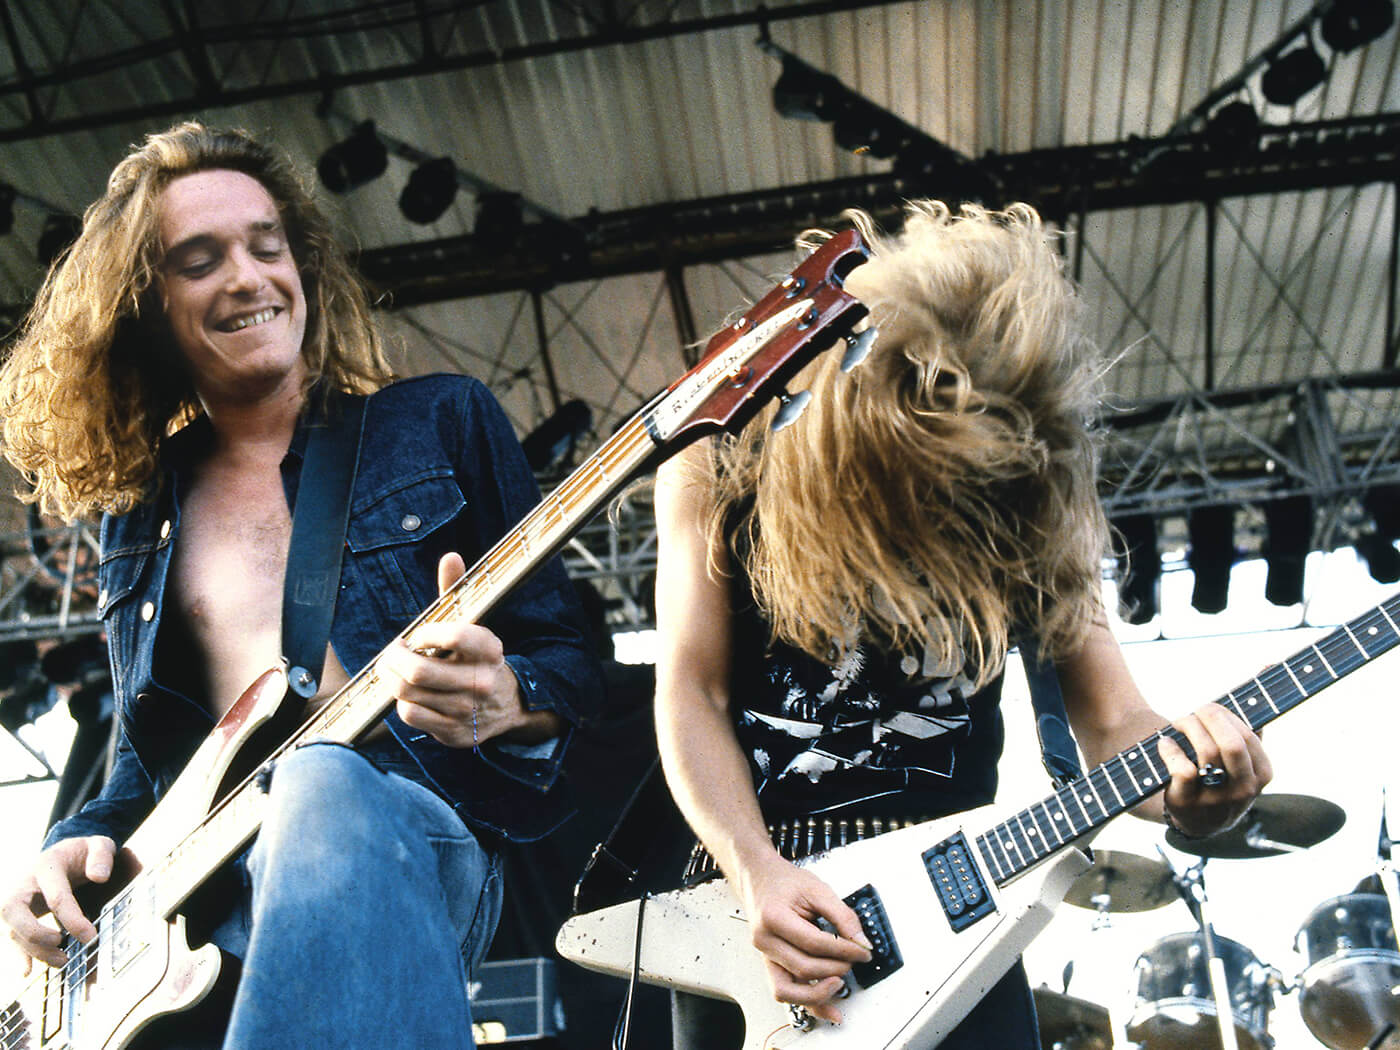 James Hetfield and Cliff Burton